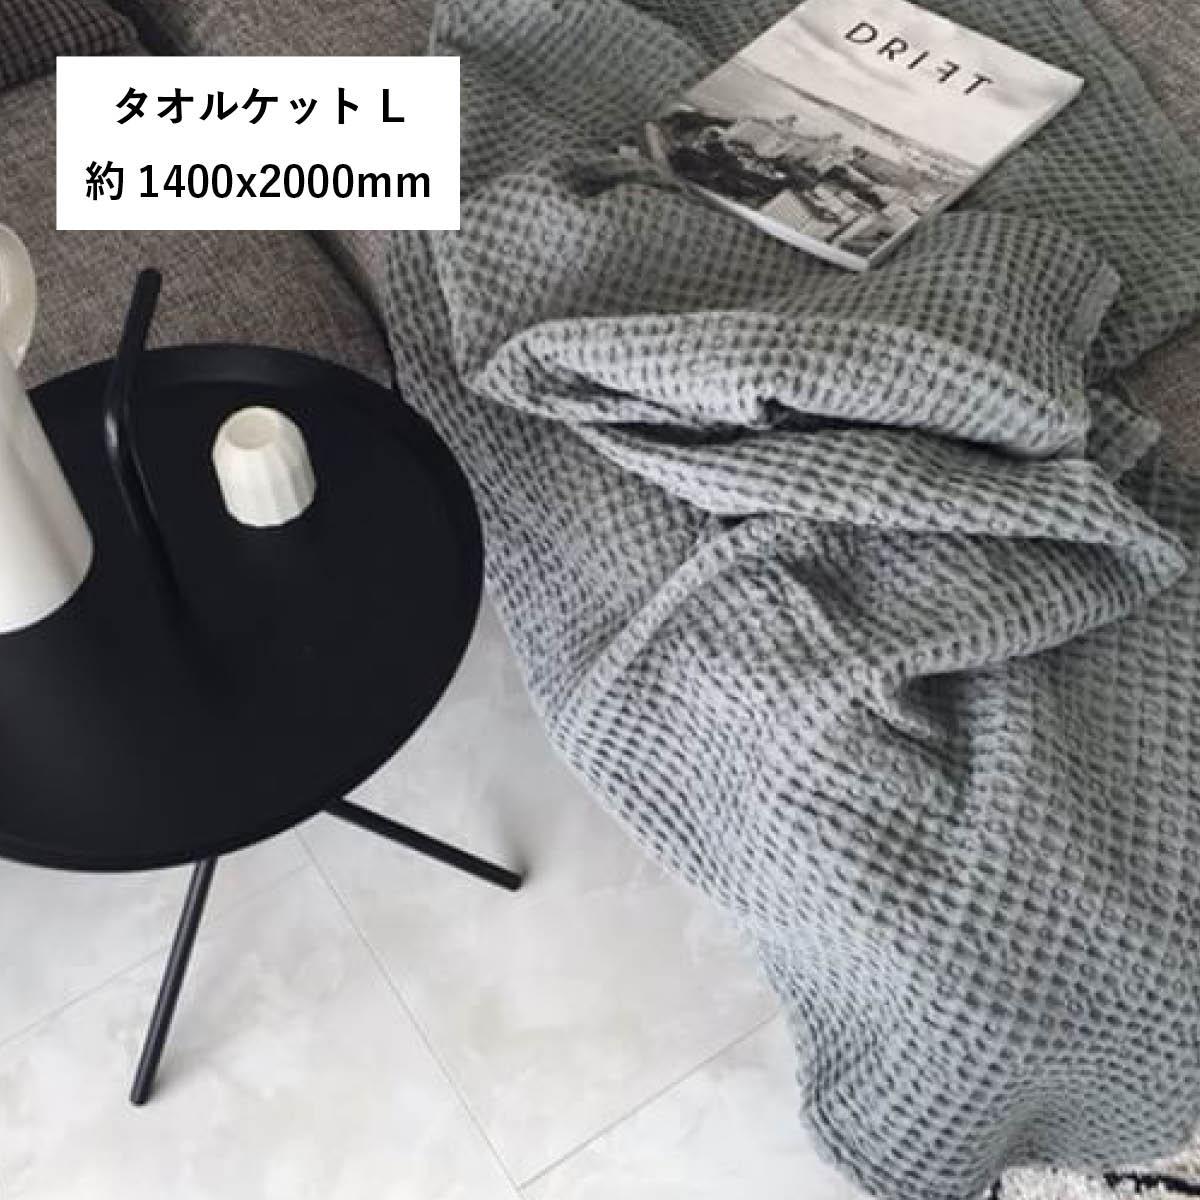 [b2cオーガニックコットン ワッフル タオルケット L] 洗える寝具 丸洗いOK 吸汗速乾 タオルケット 無地 シングルサイズ 寝具 日本製